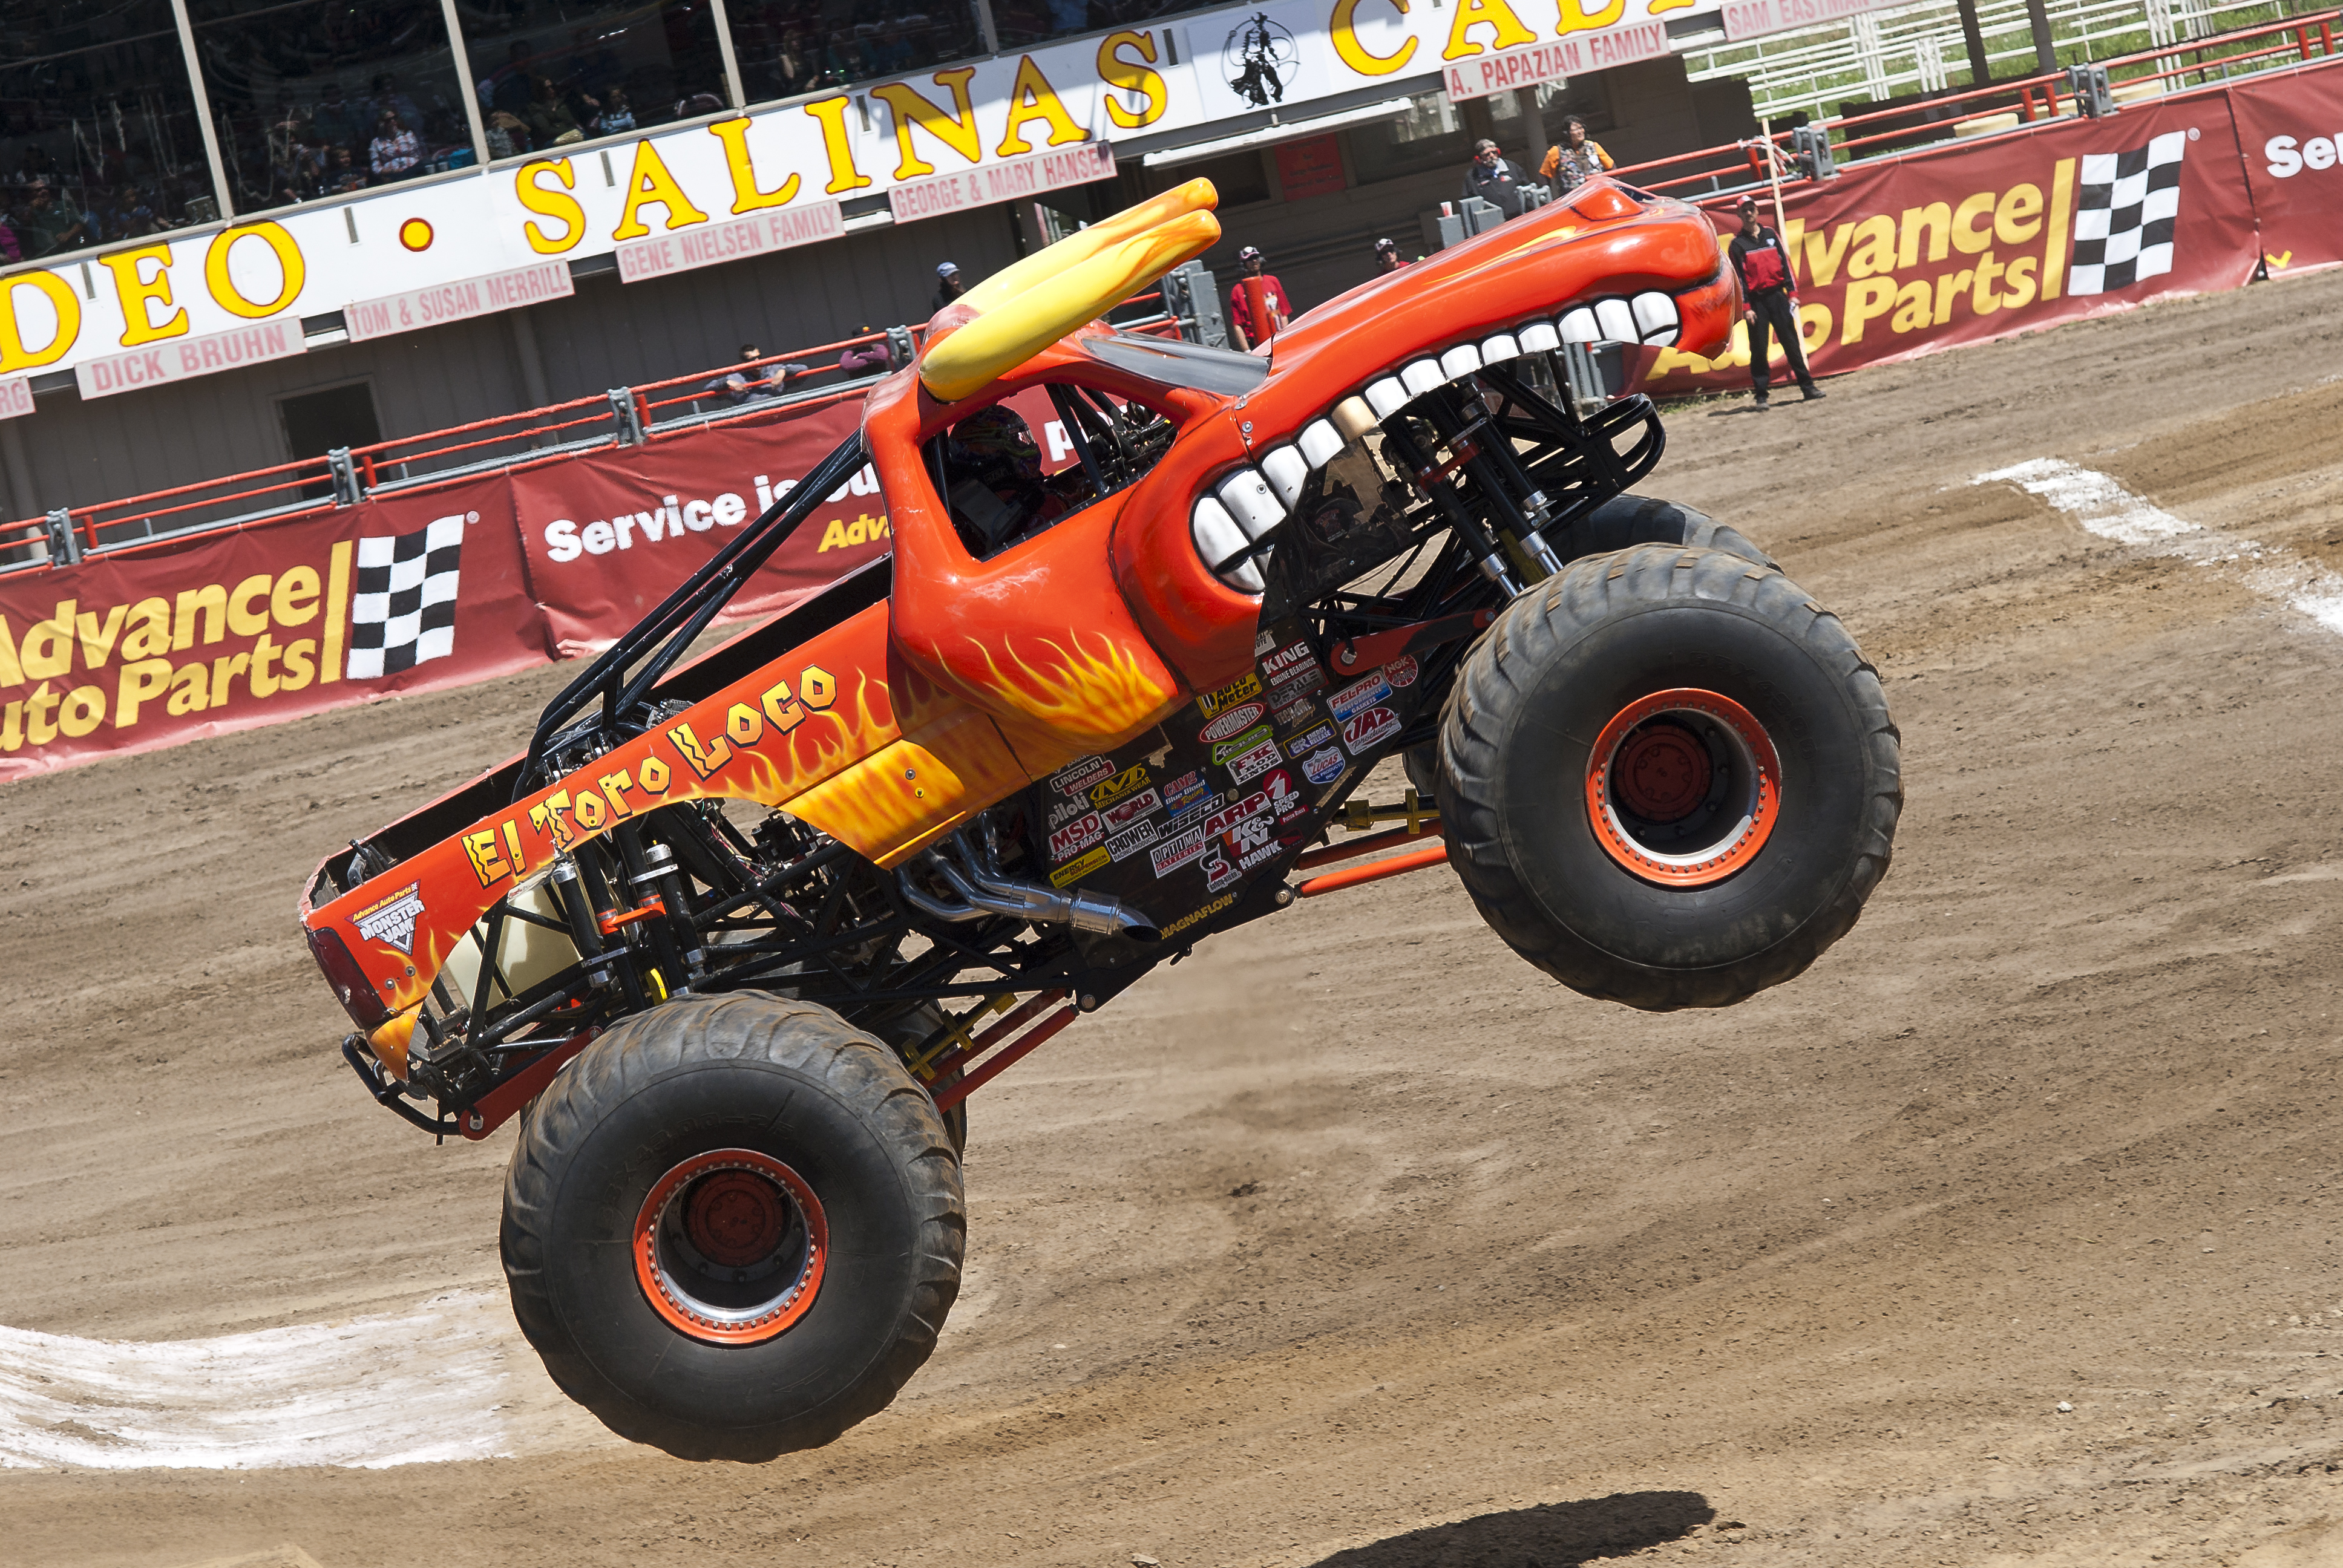 El Toro Loco Monster Truck By Brandonlee88 On Deviantart